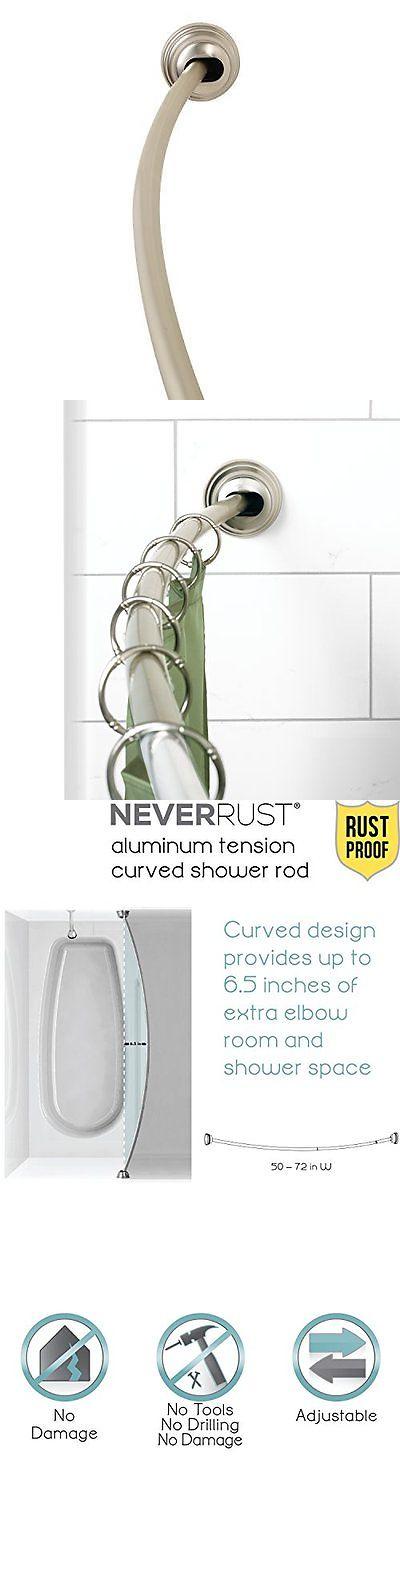 Shower Curtain Rods 168132: Zenna Home 35633Bnp, Neverrust Aluminum Tension Curved  Shower Curtain Rod